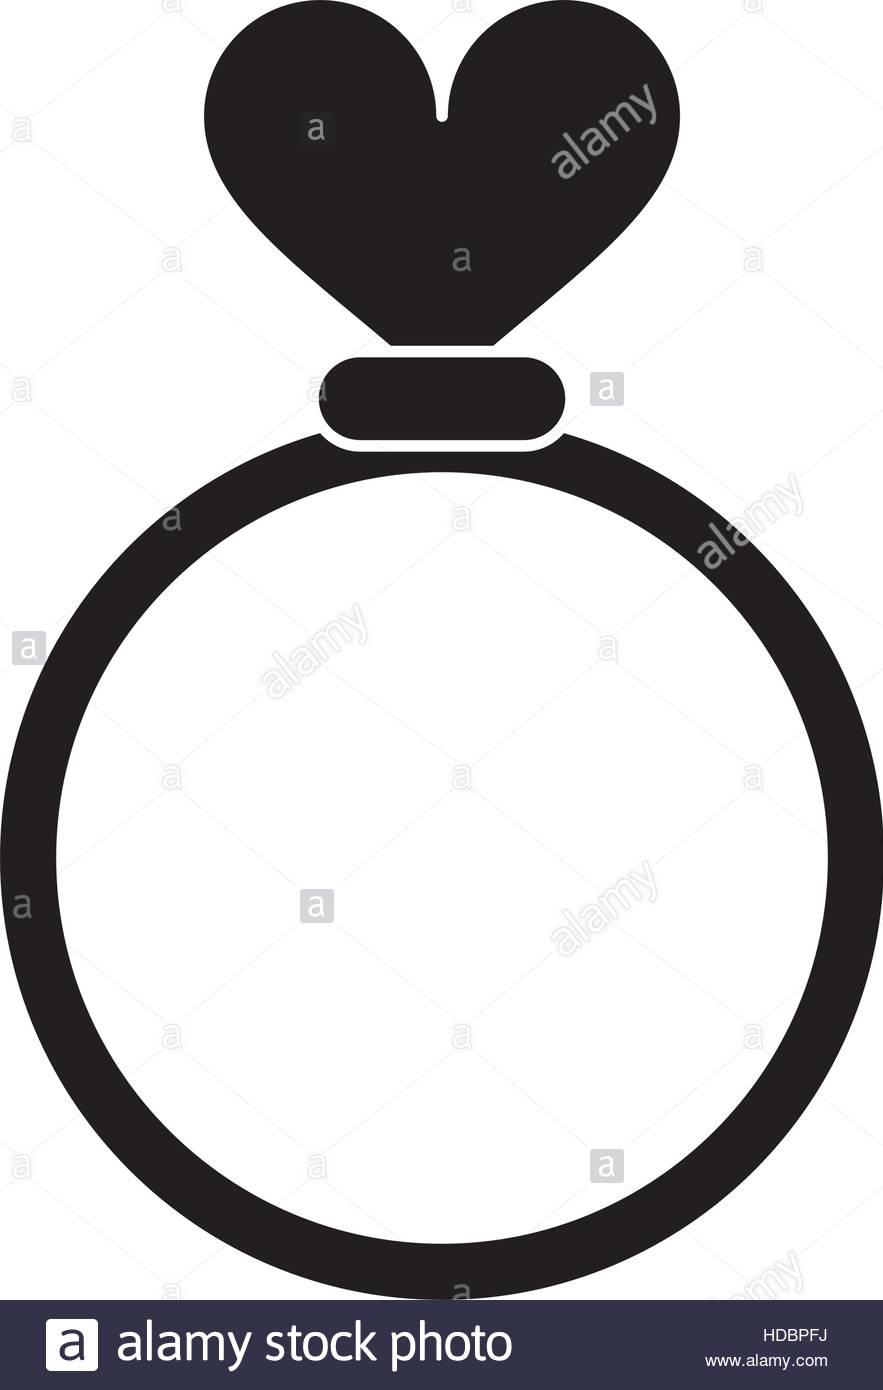 883x1390 Silhouette Romance Rings Love Heart Wedding Symbol Stock Vector